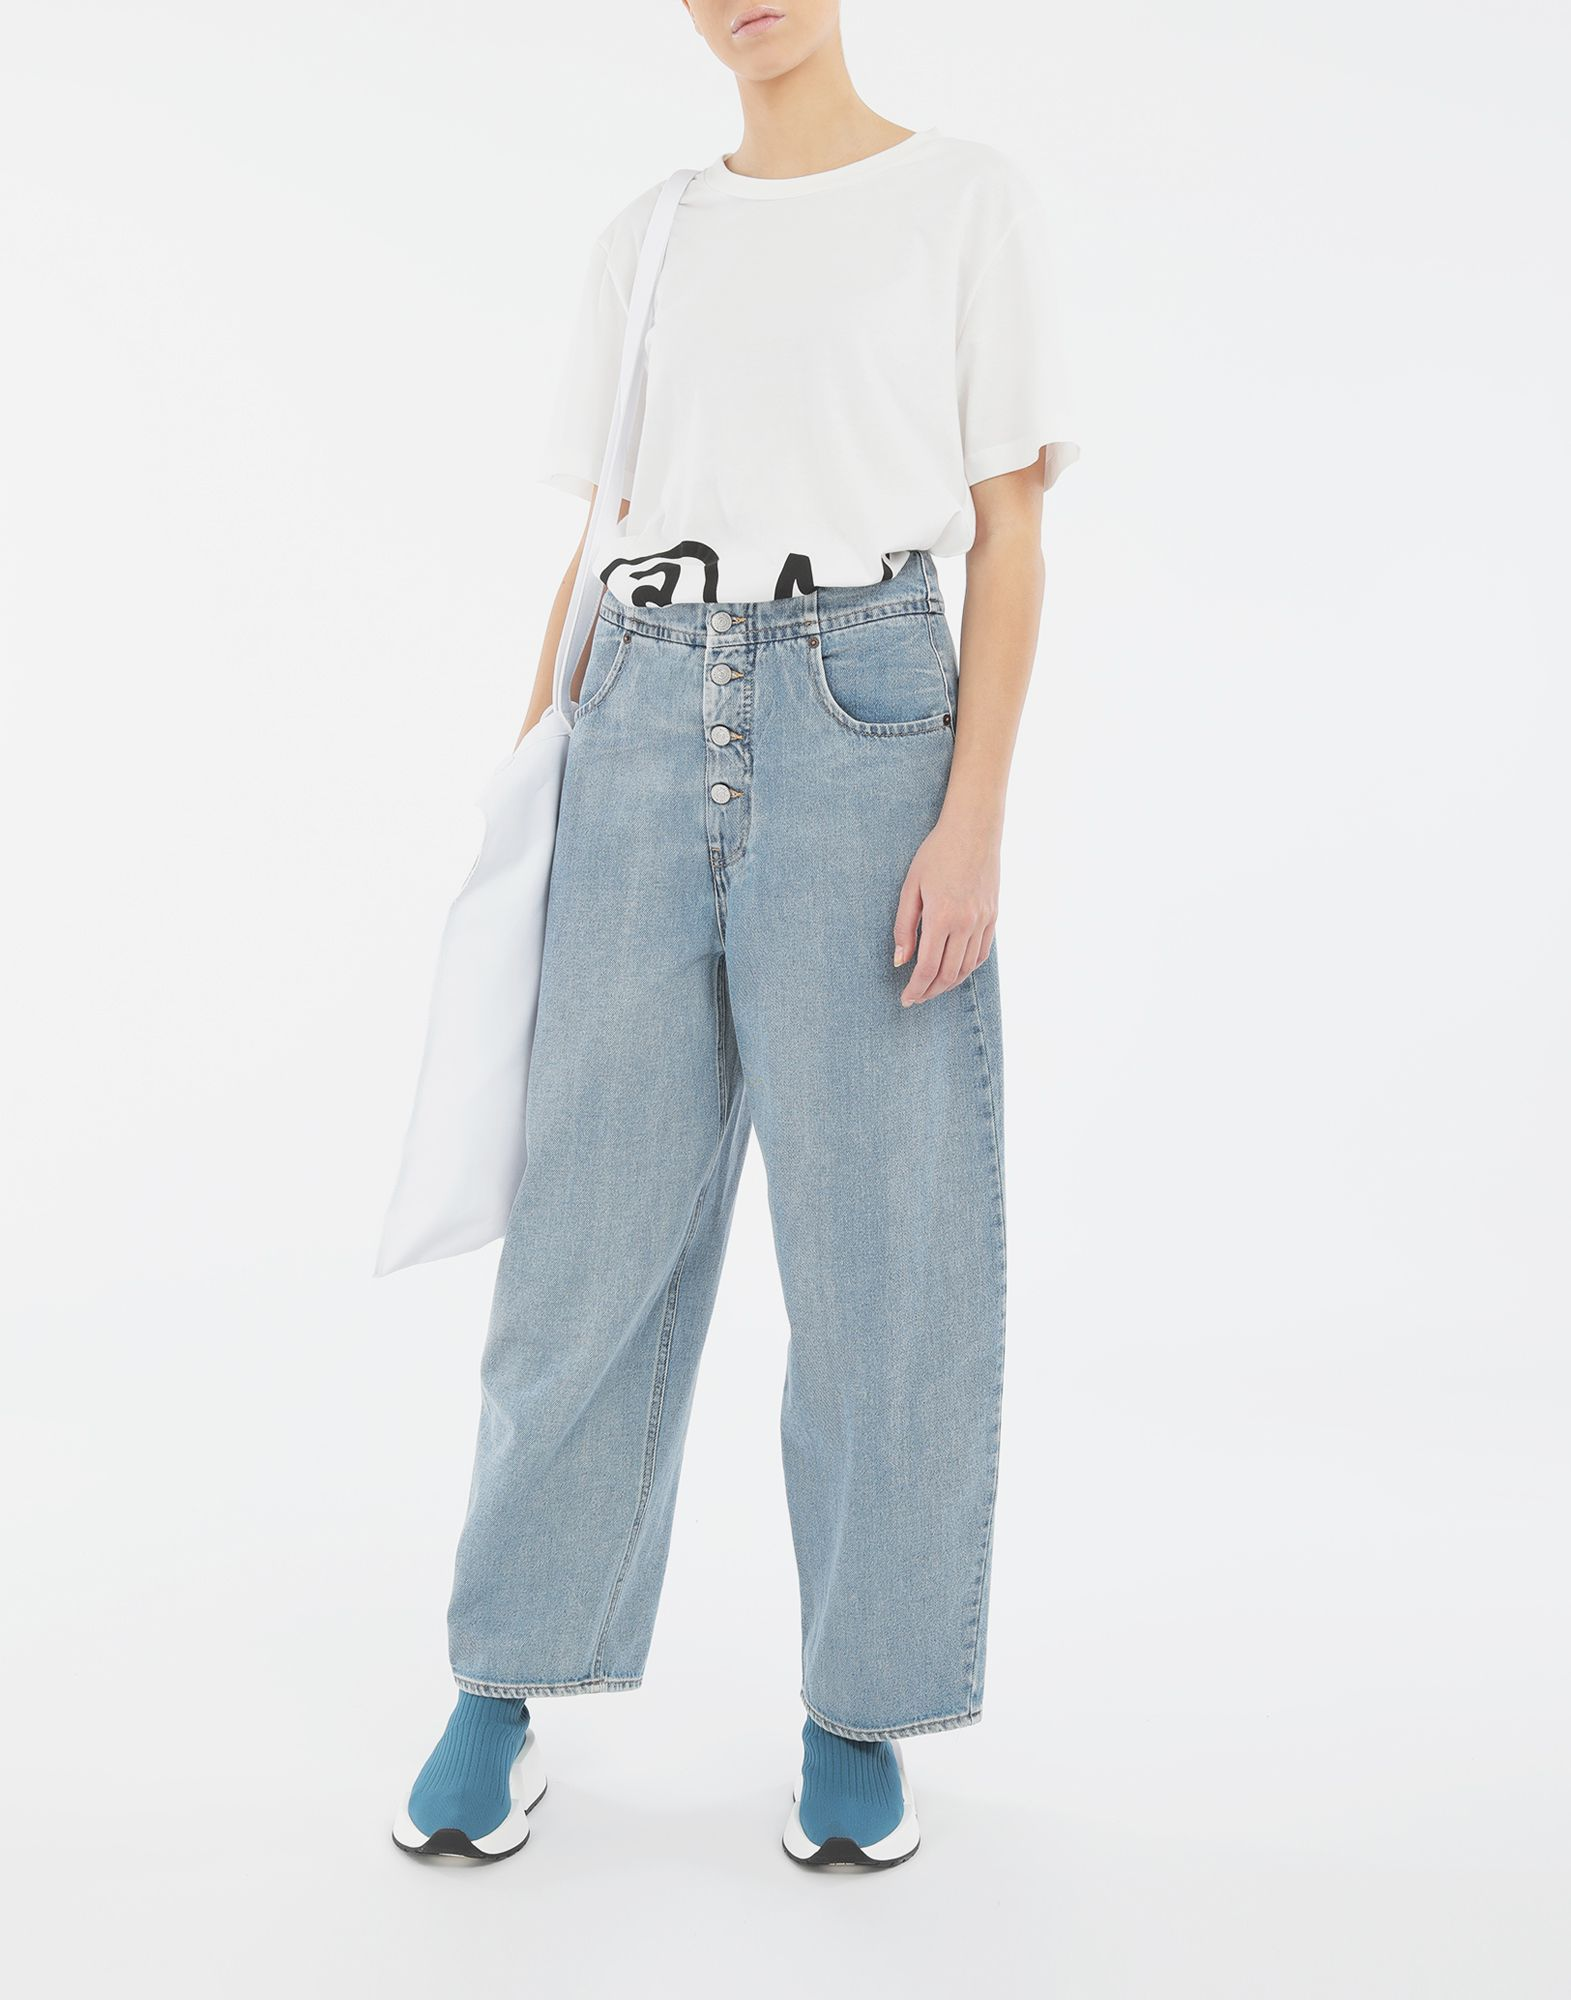 MM6 MAISON MARGIELA Jean cocon Pantalon en jean Femme d